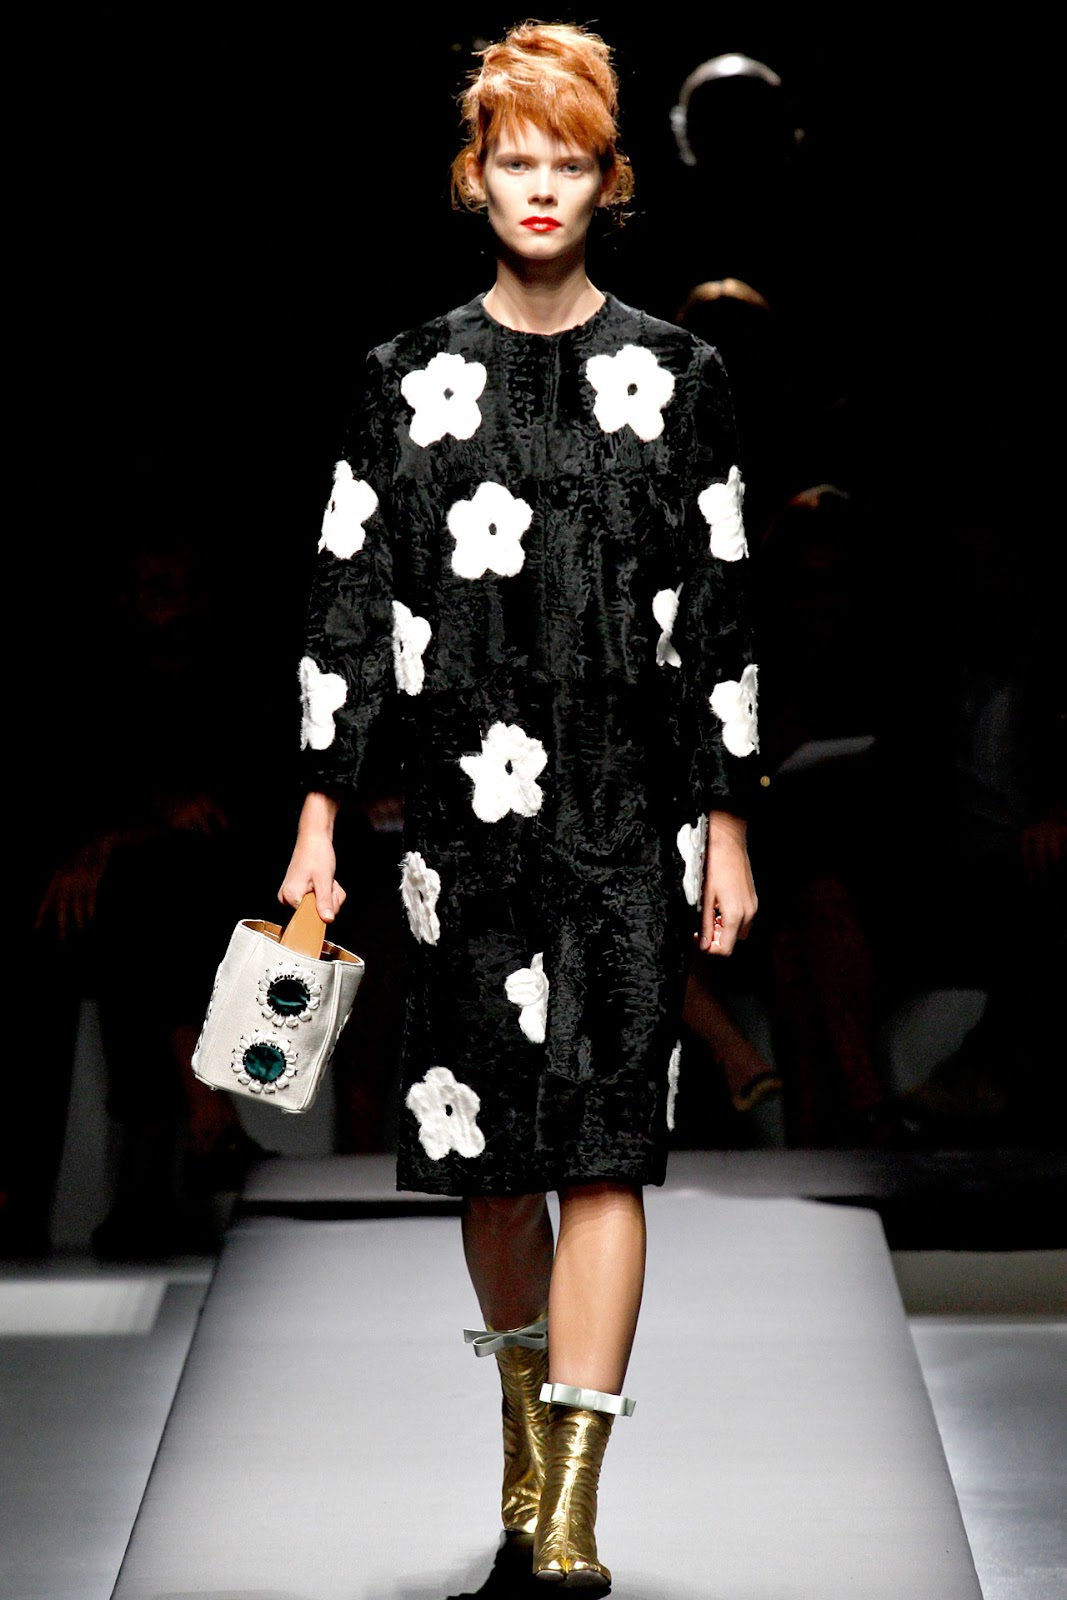 Milan Fashion Week Explained